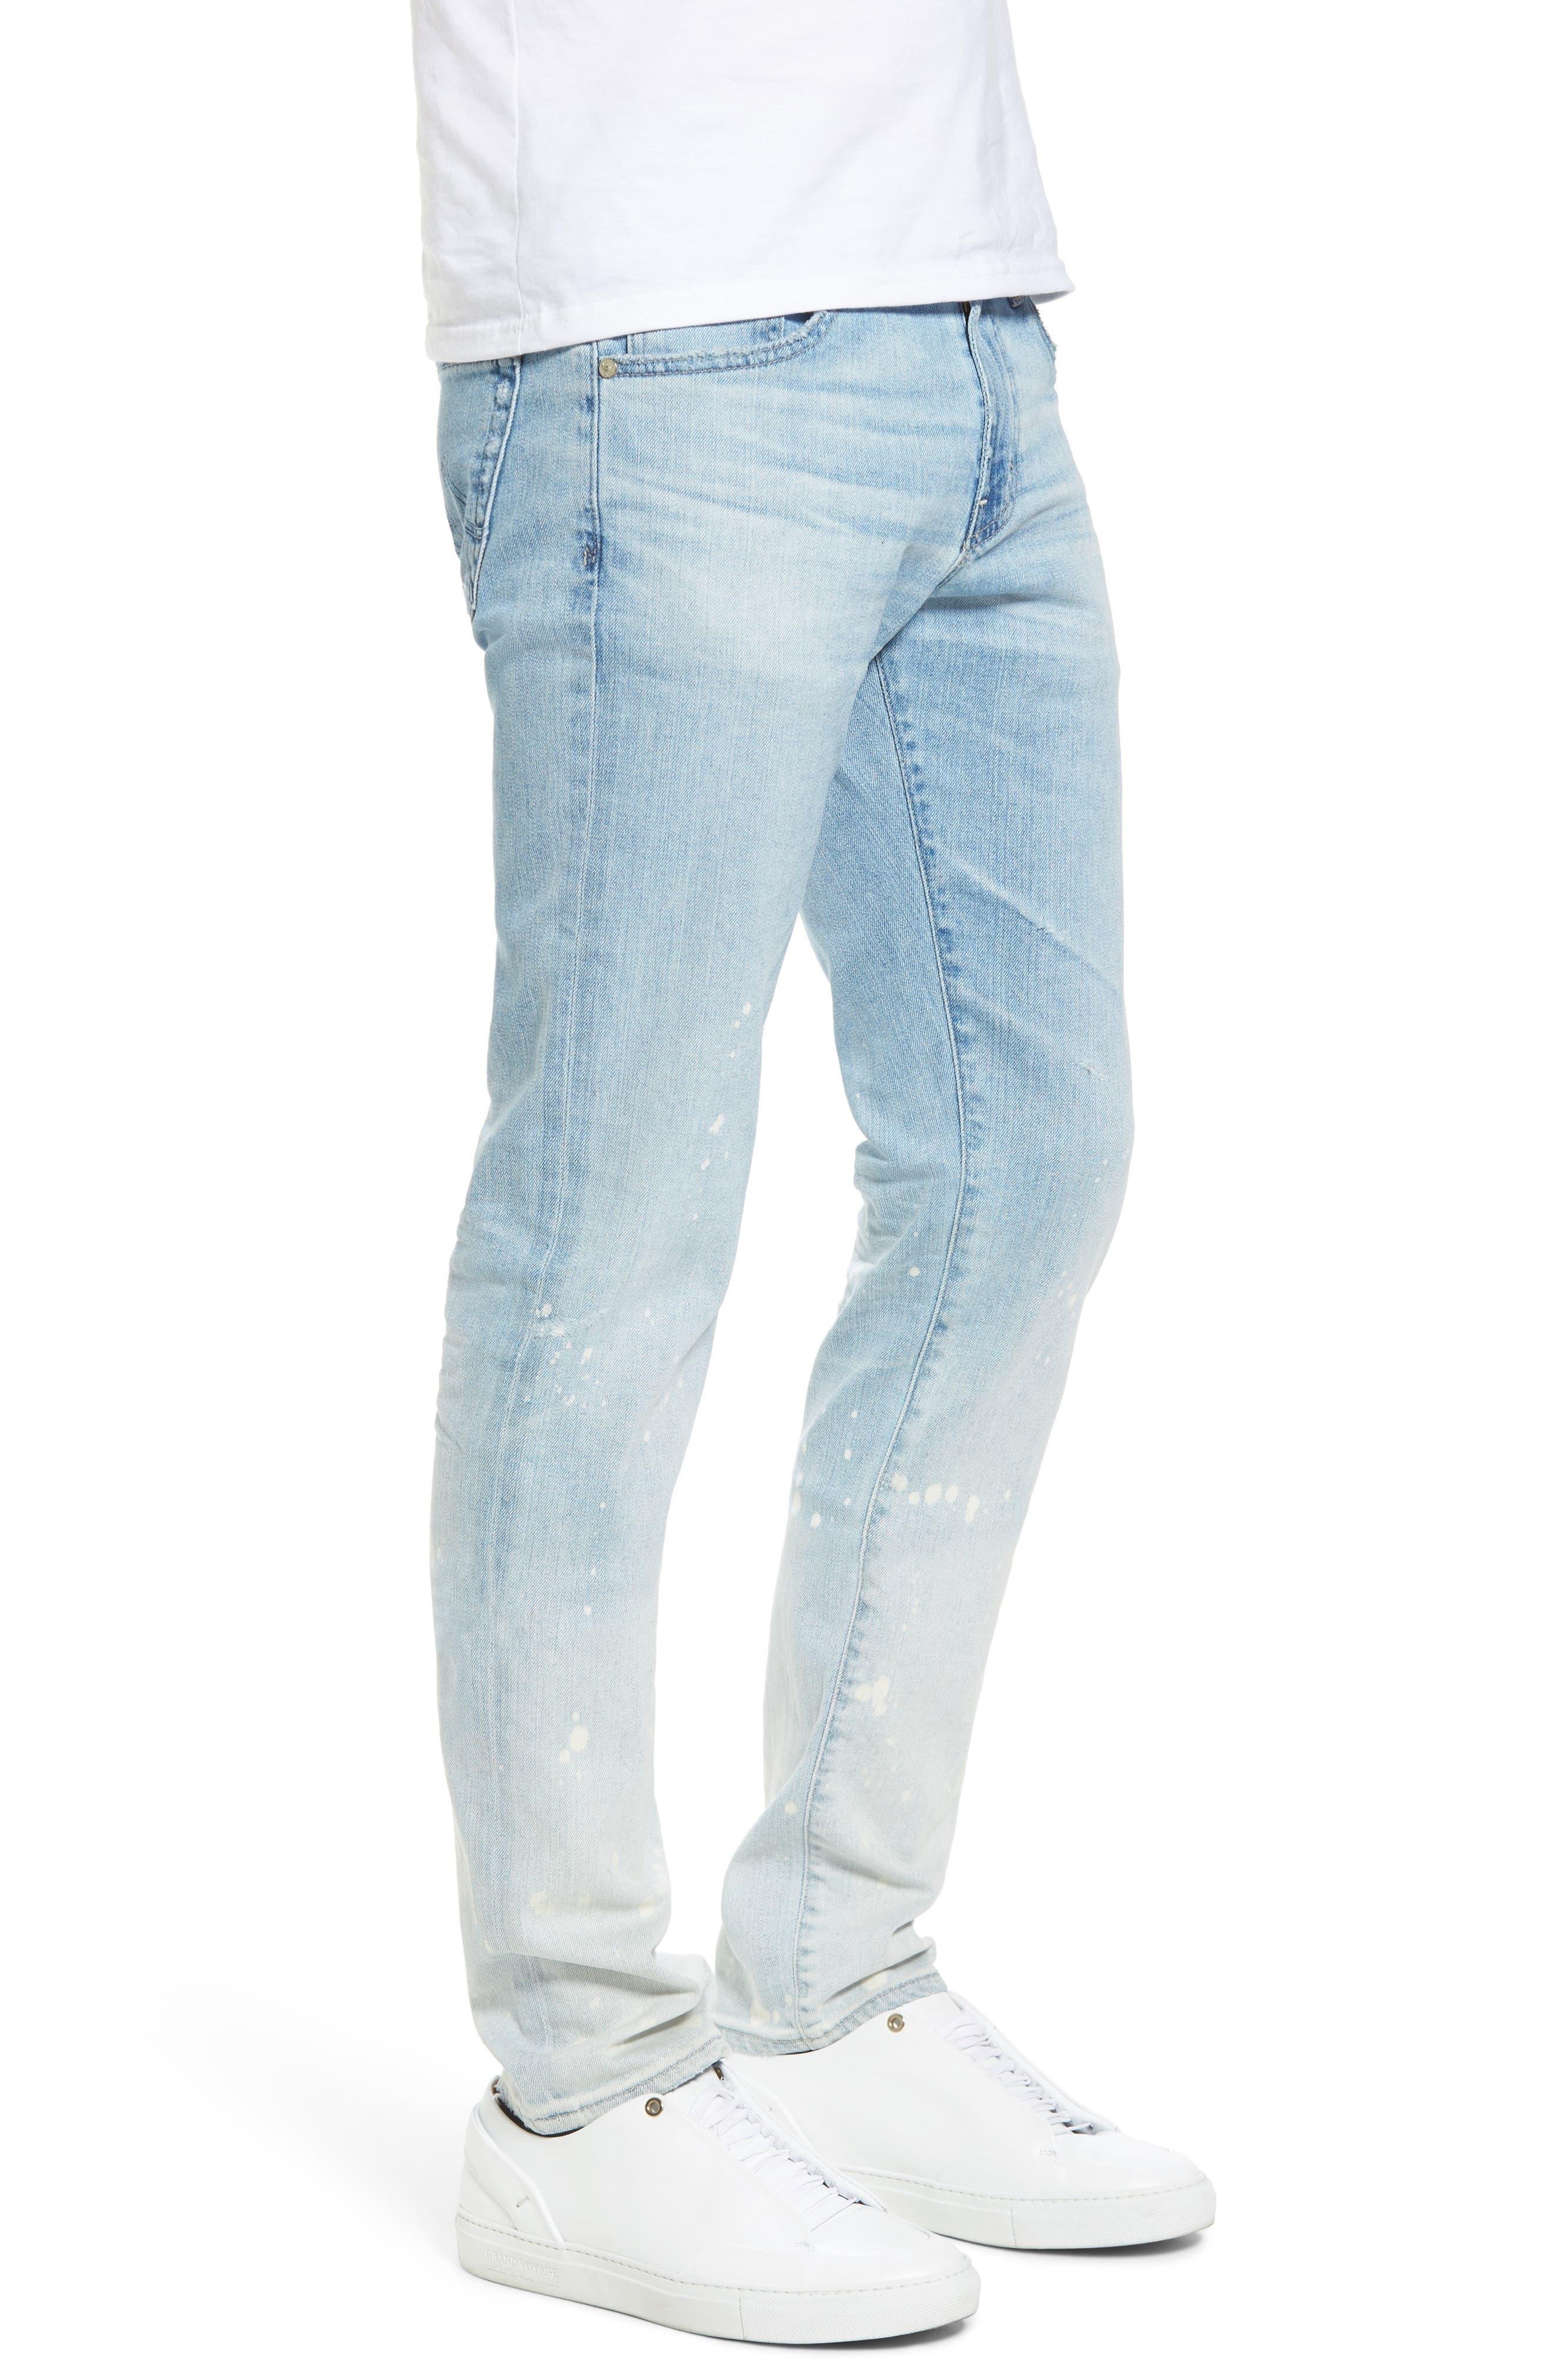 Dylan Slim Skinny Fit Jeans,                             Alternate thumbnail 3, color,                             23 Years Oceanside